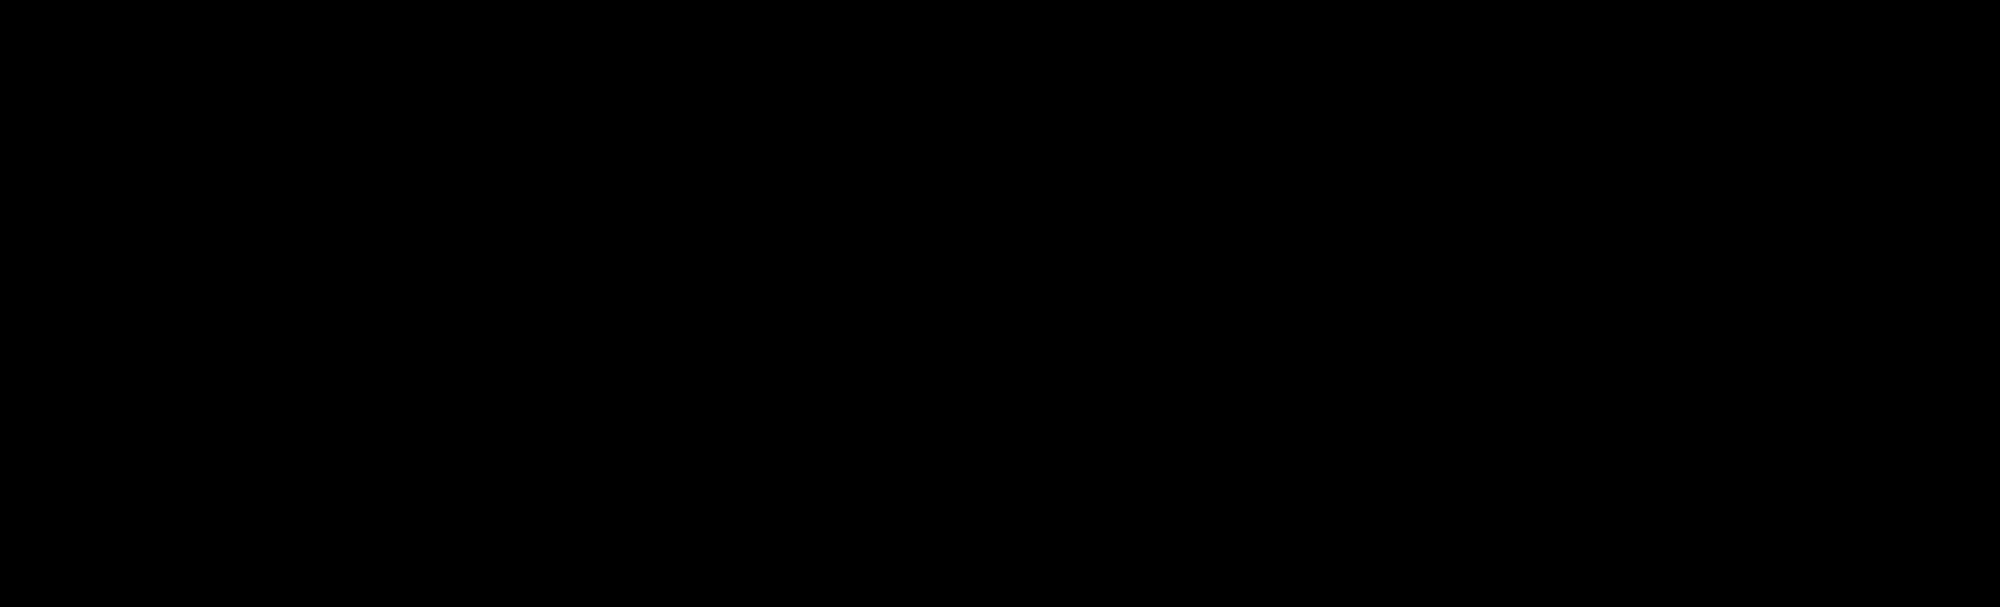 Logo Arch Enemy Png - Datei:archenemy Logo.svg, Transparent background PNG HD thumbnail